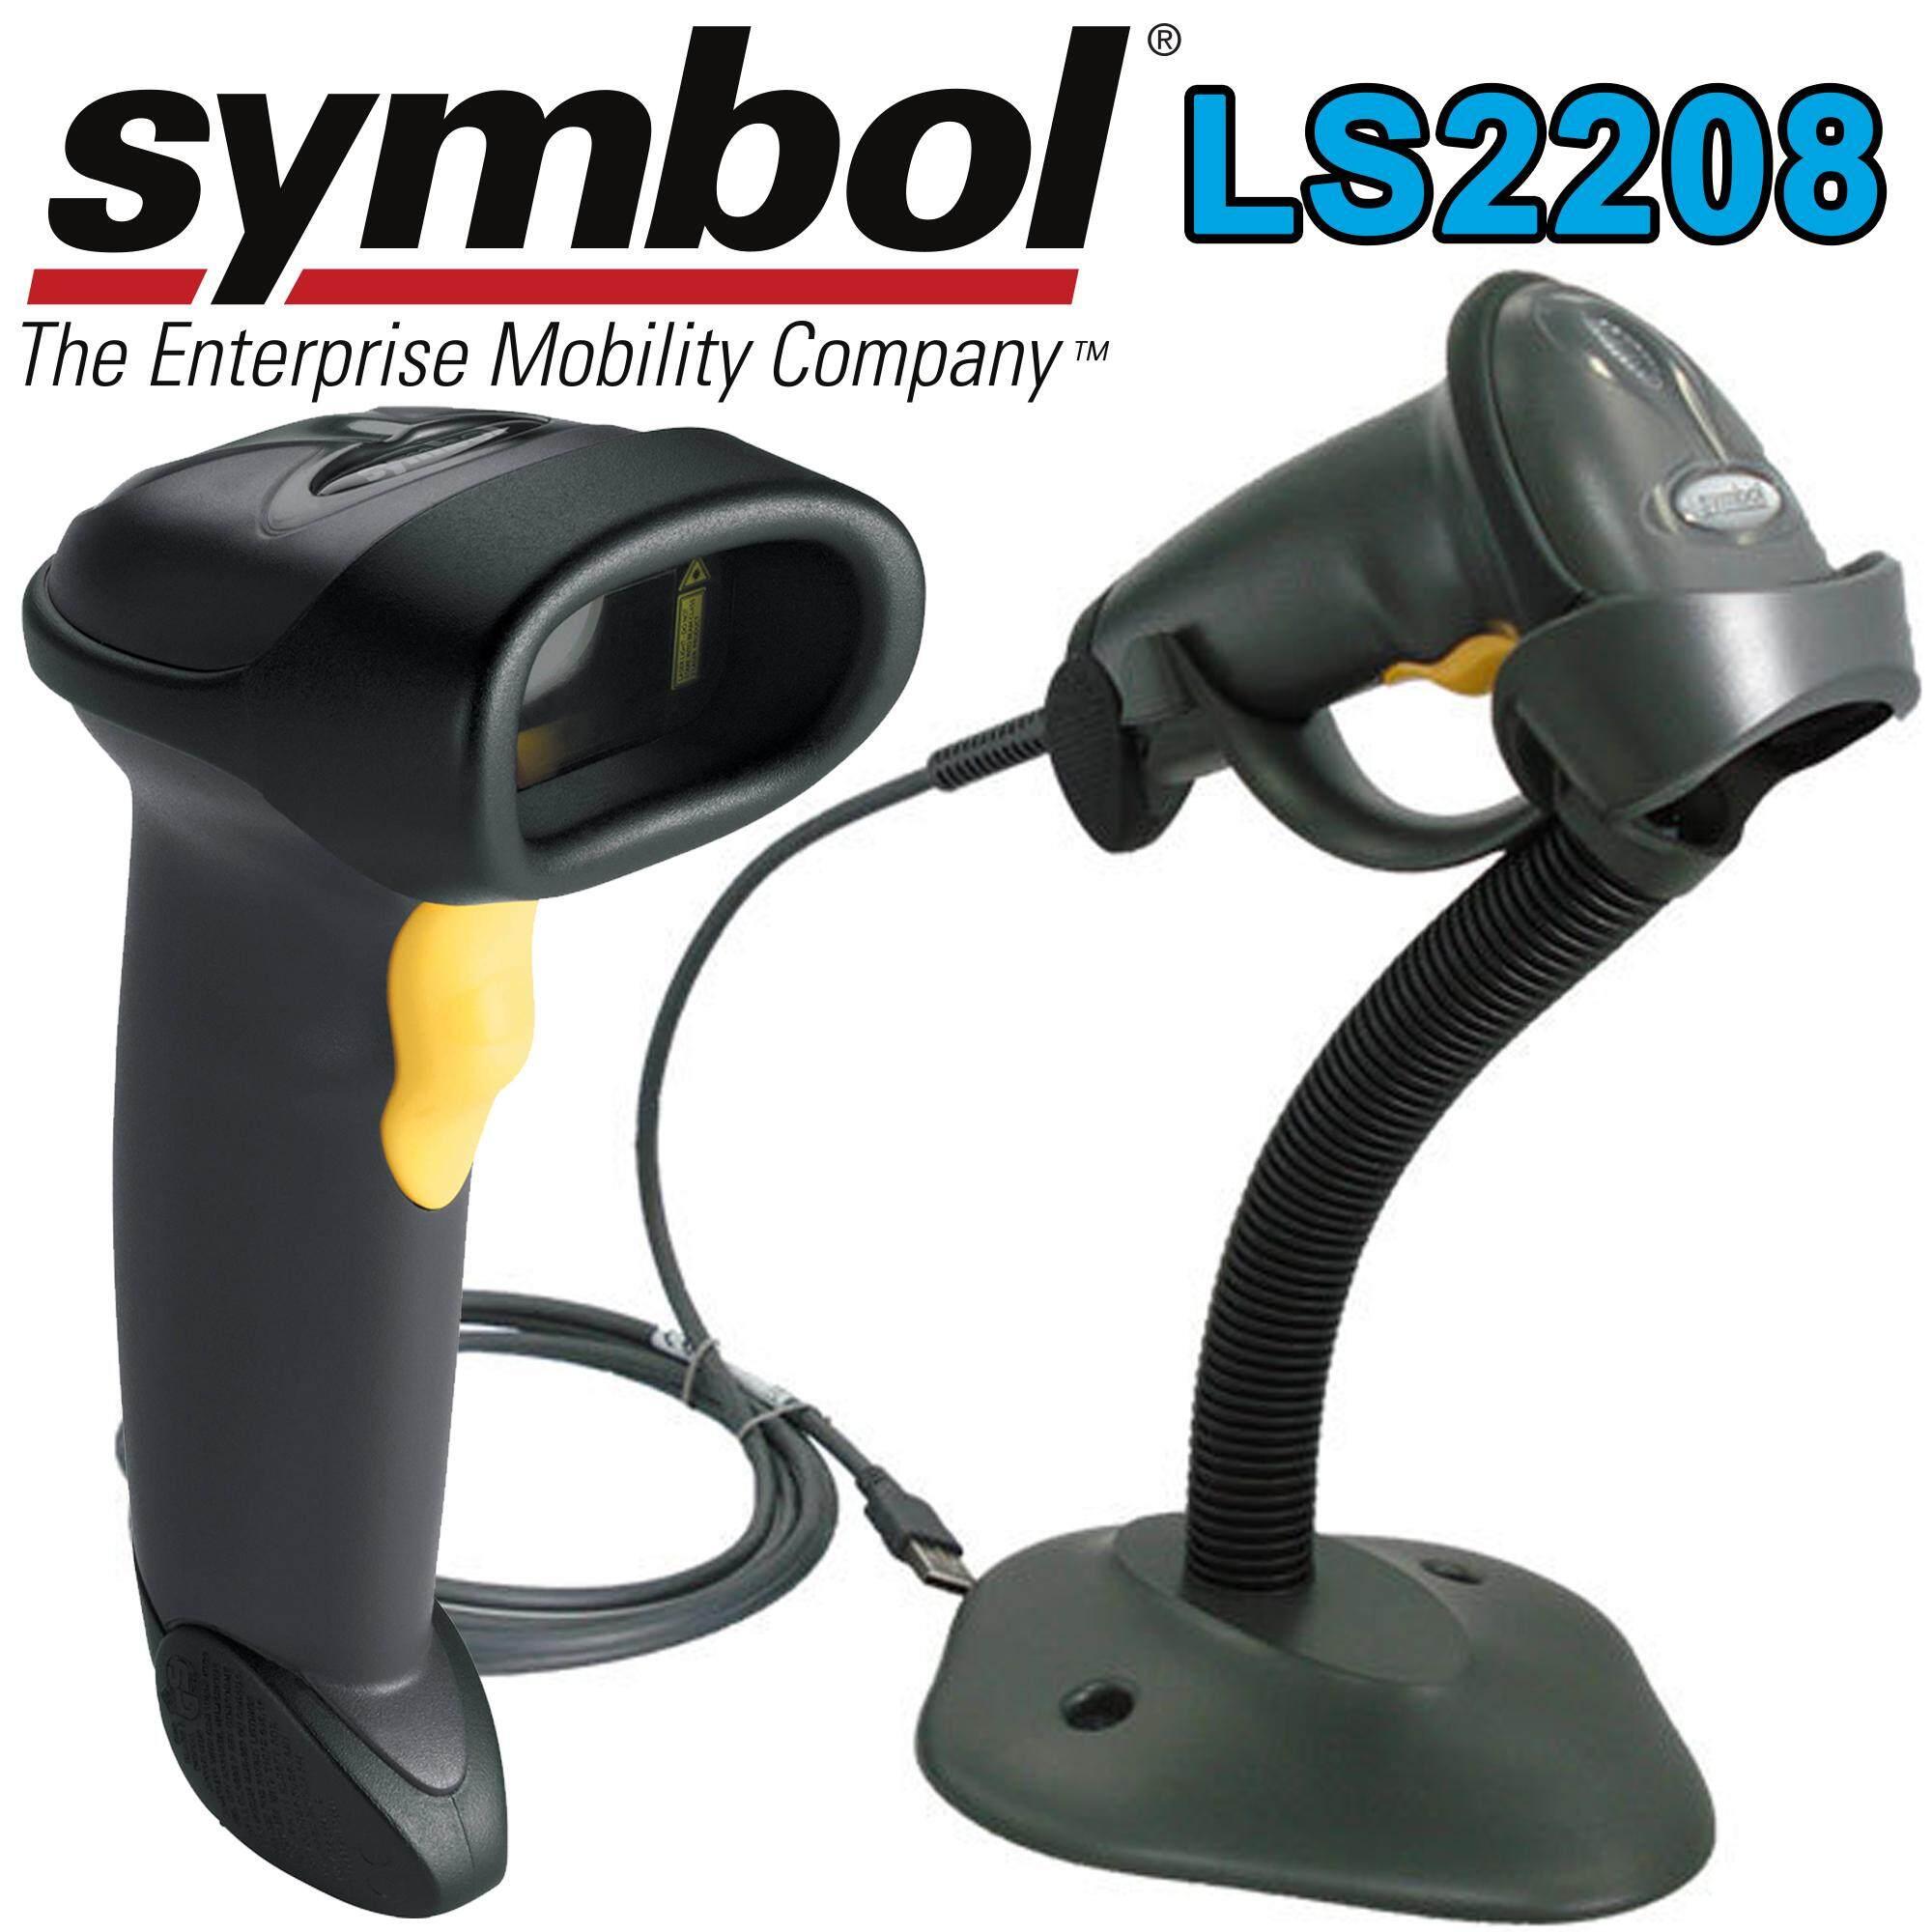 Symbol Ls2208 เครื่องอ่านบาร์โค้ด By Dimoncom.